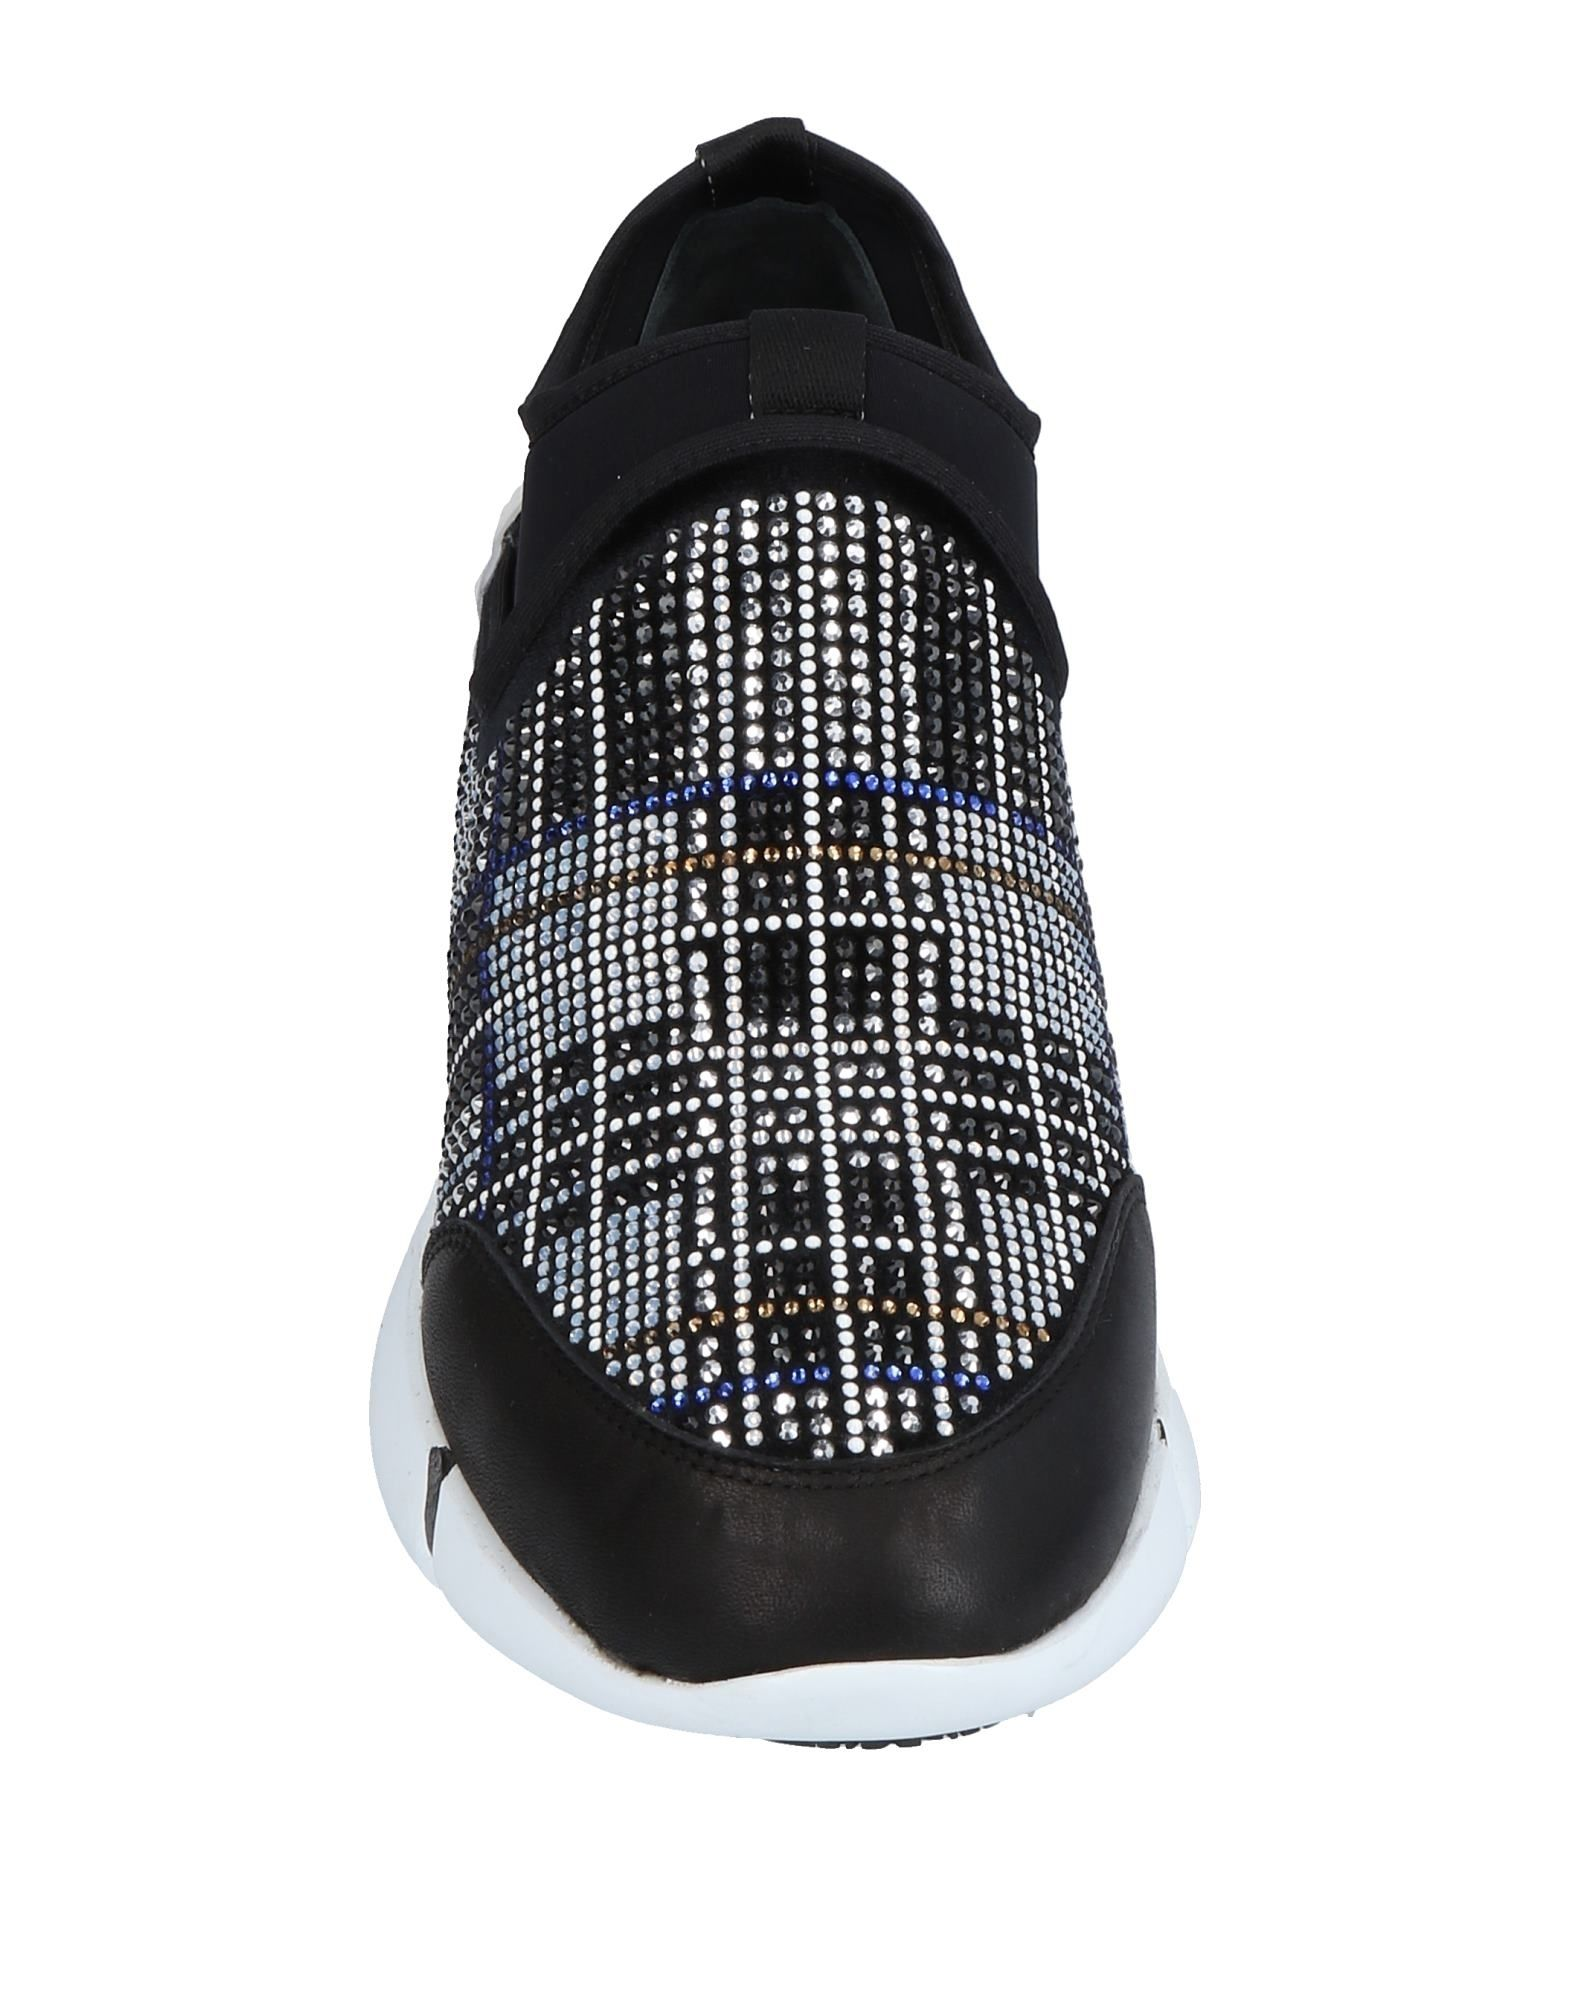 Stilvolle Sneakers billige Schuhe Elena Iachi Sneakers Stilvolle Damen  11503236TC e66778